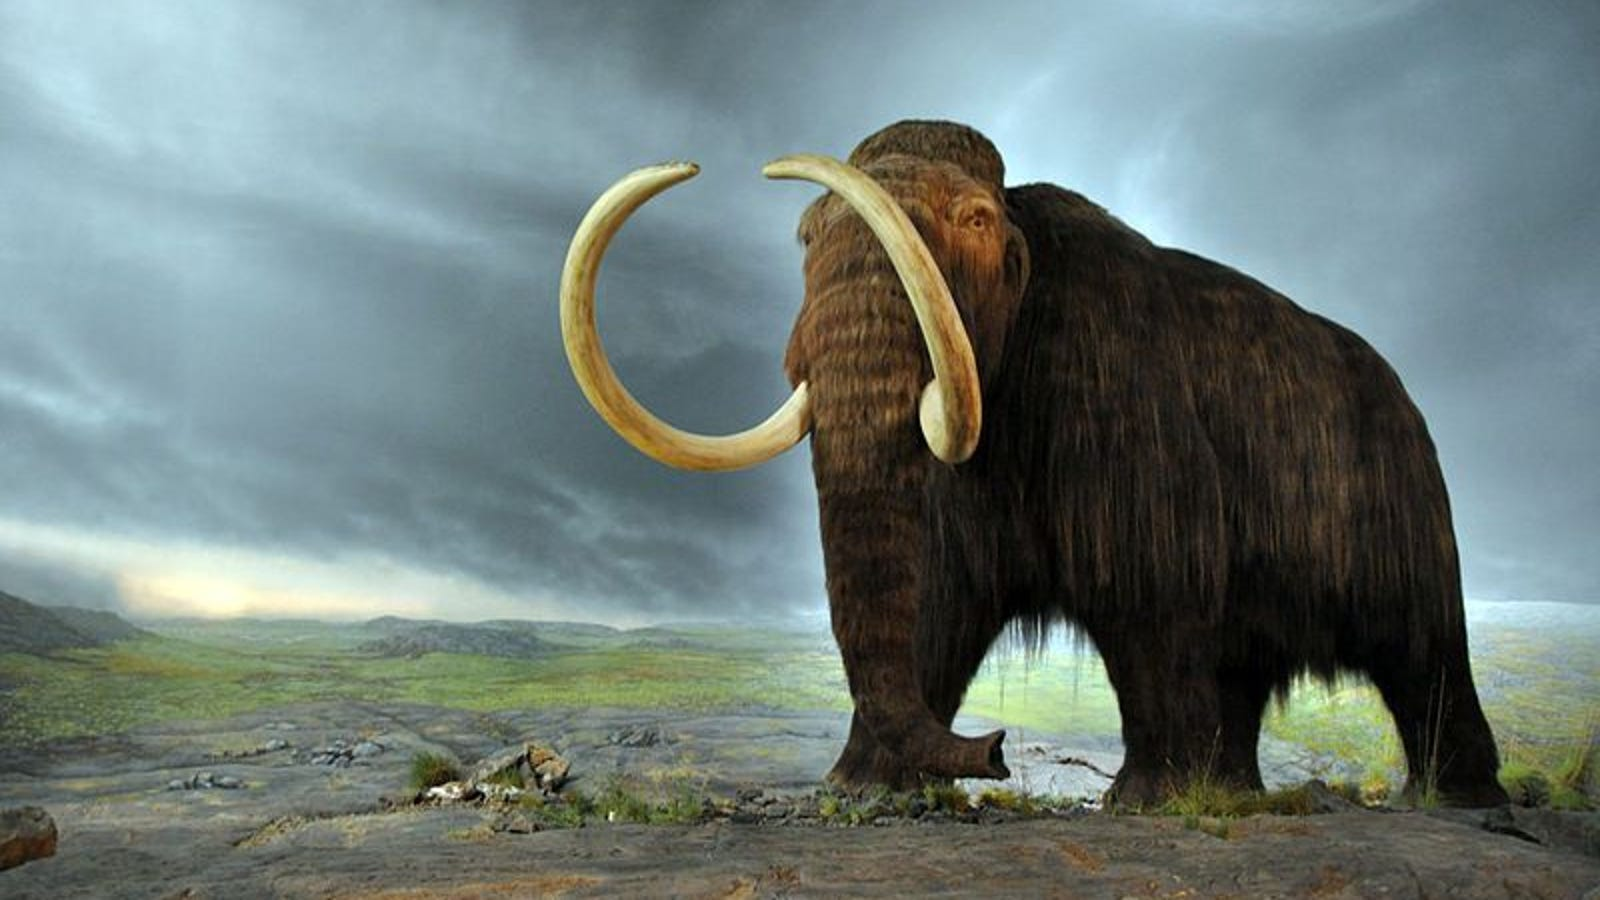 Should we start de-extincting species that have died out?